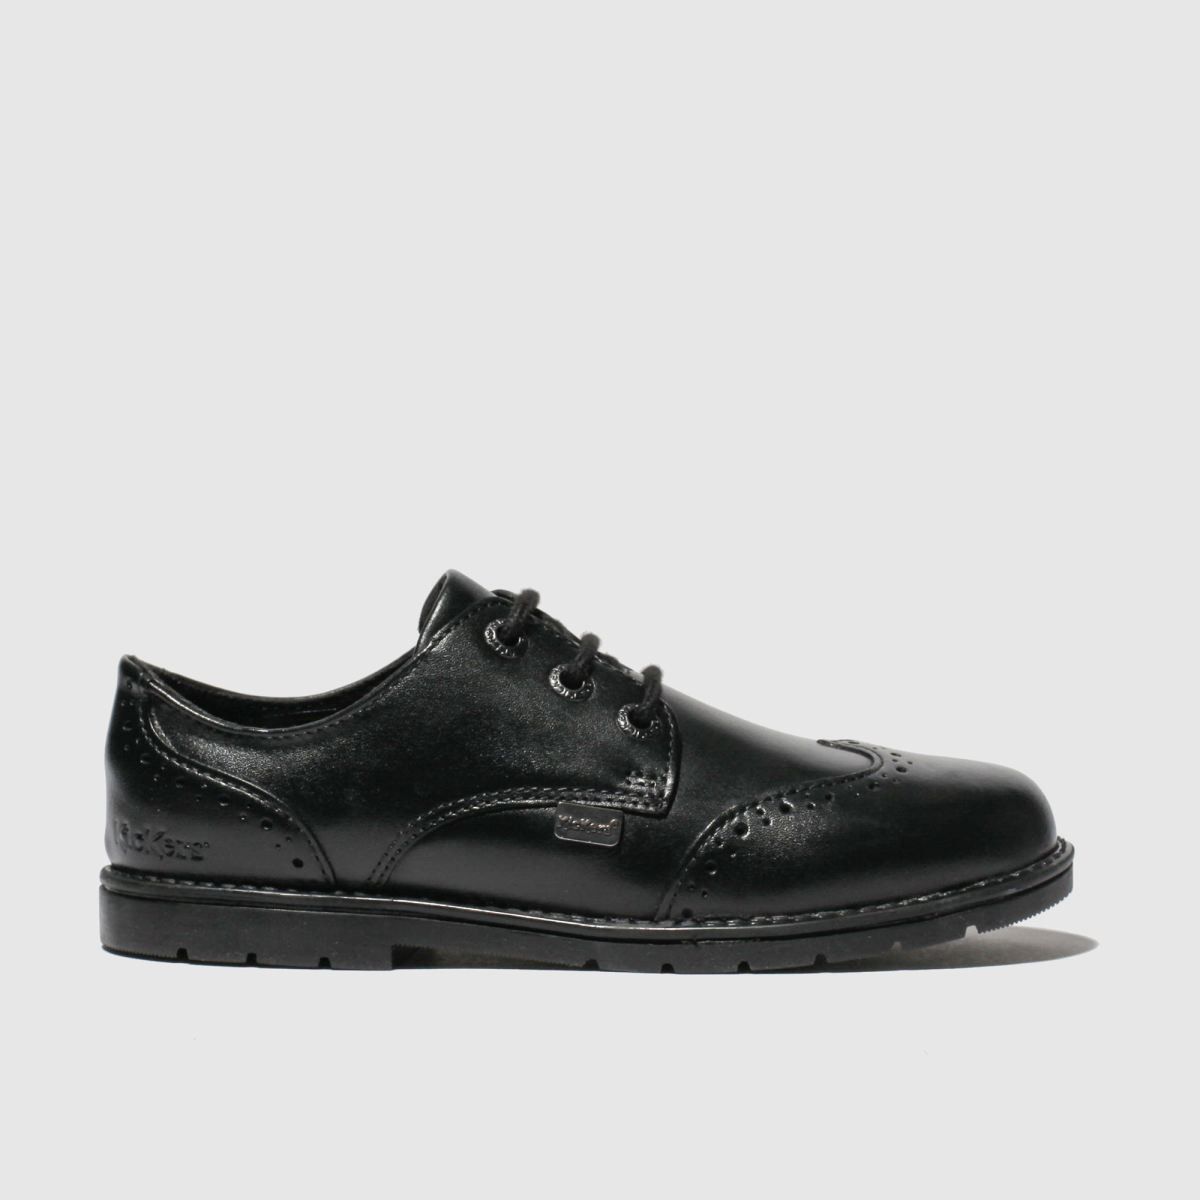 Kickers Kickers Black Orin Brogue Lo Shoes Toddler